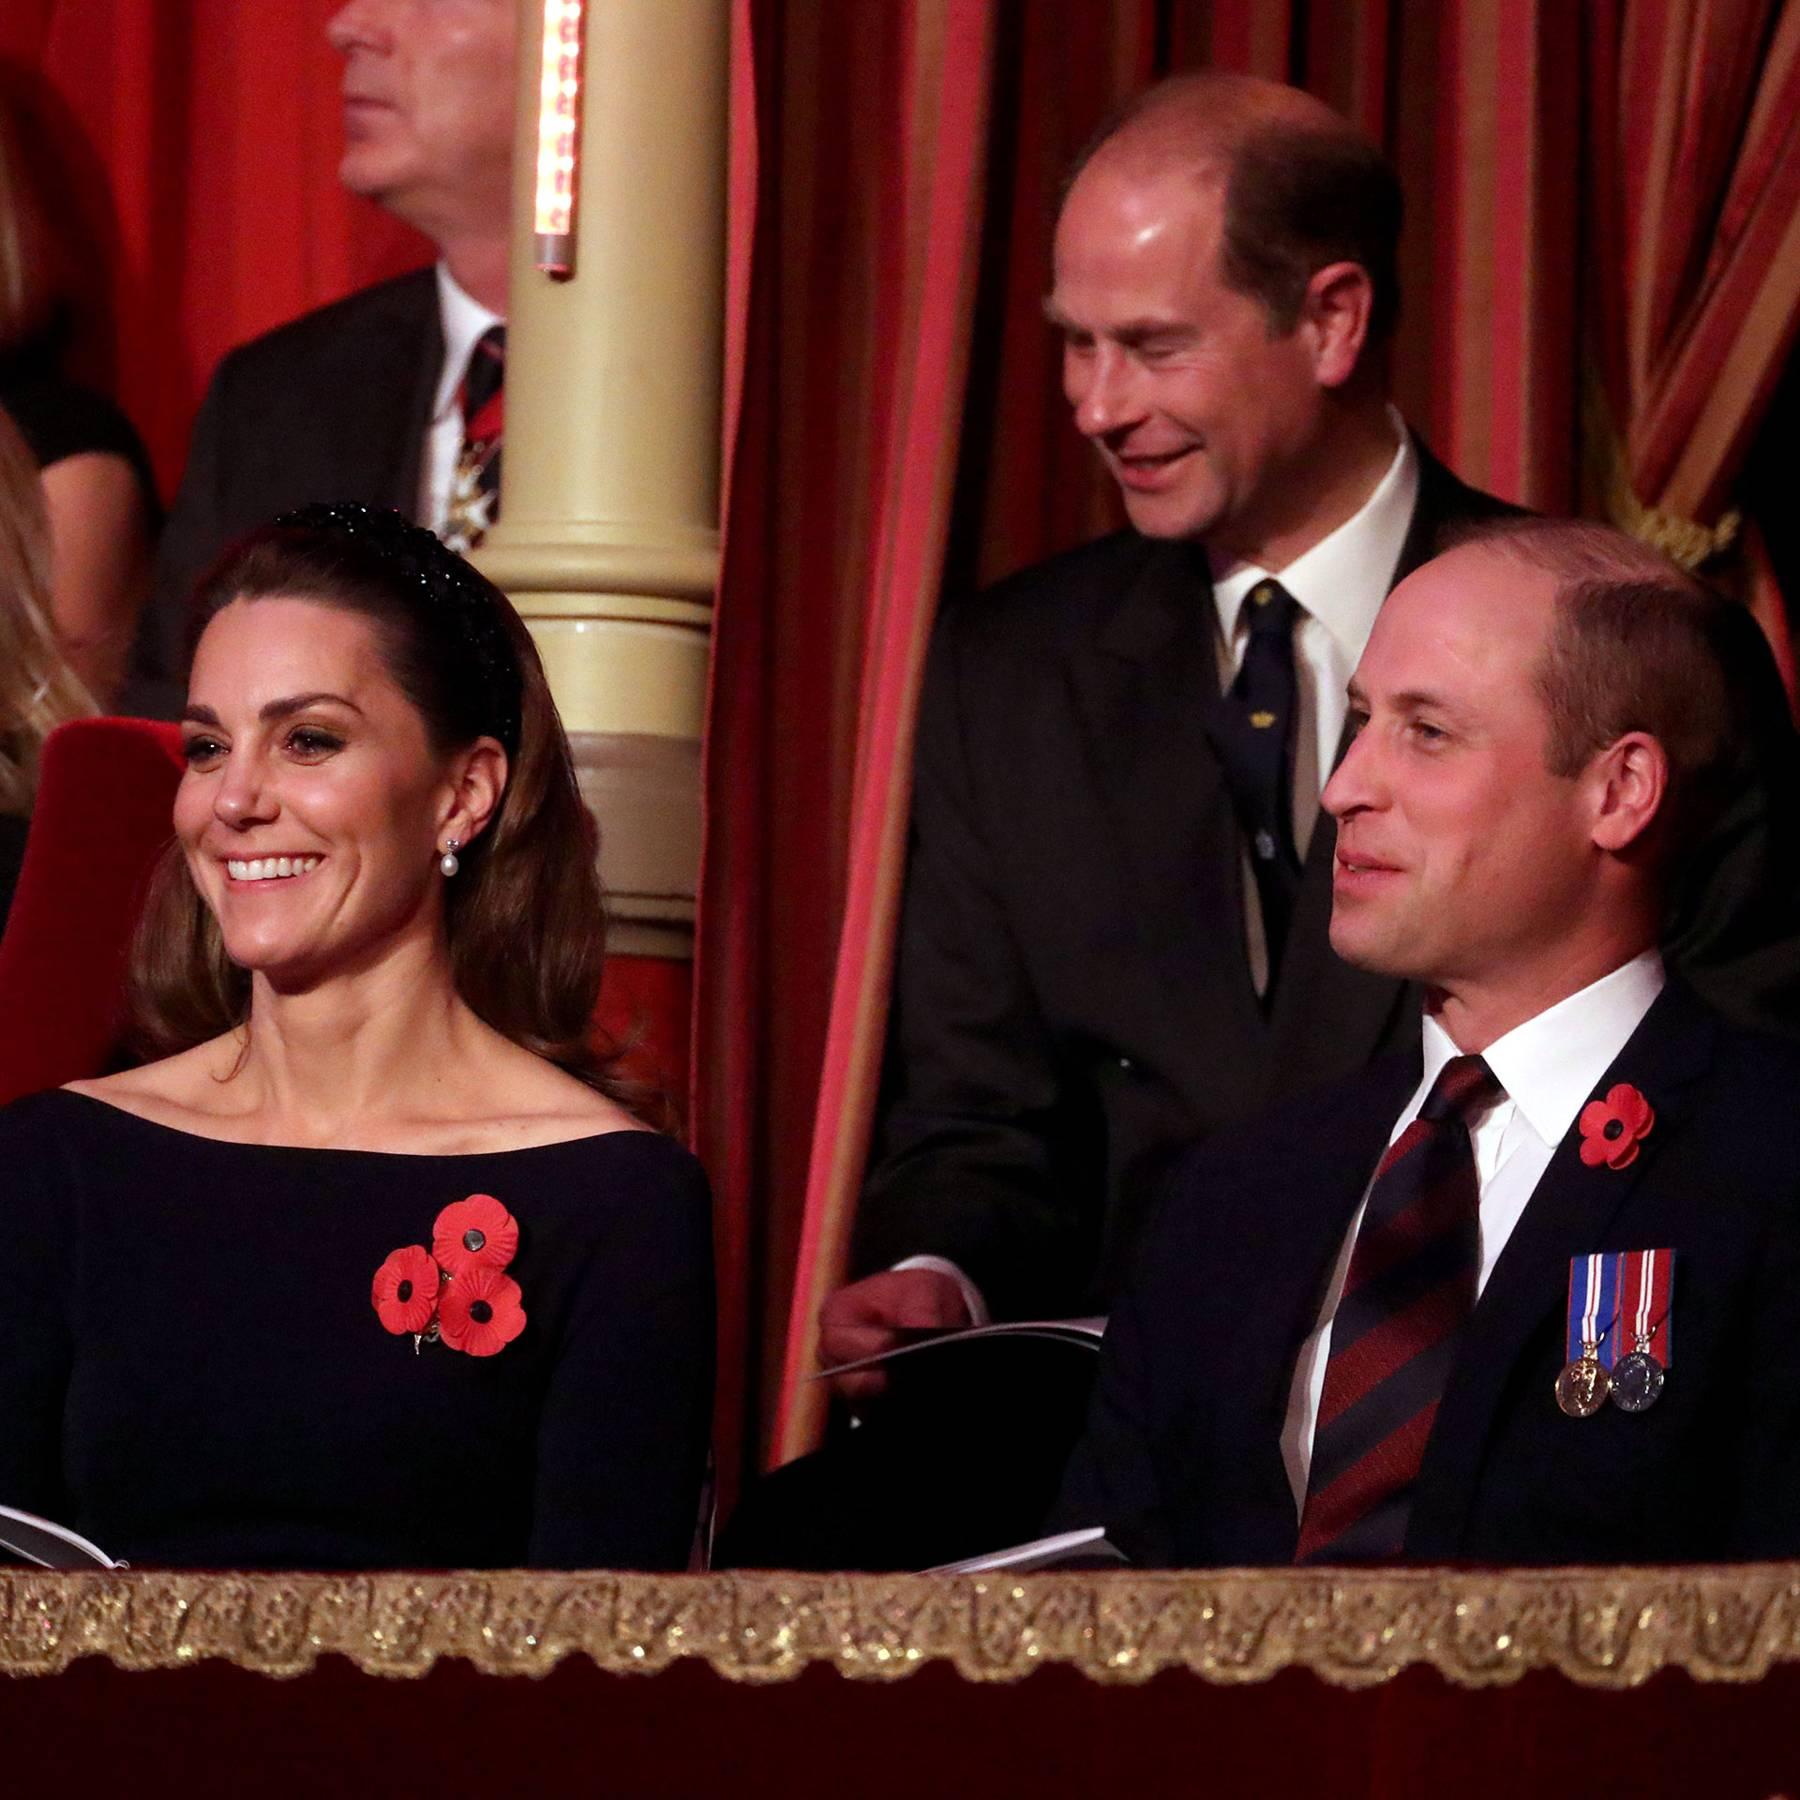 The Duke and Duchess of Cambridge's housekeeper just got honoured